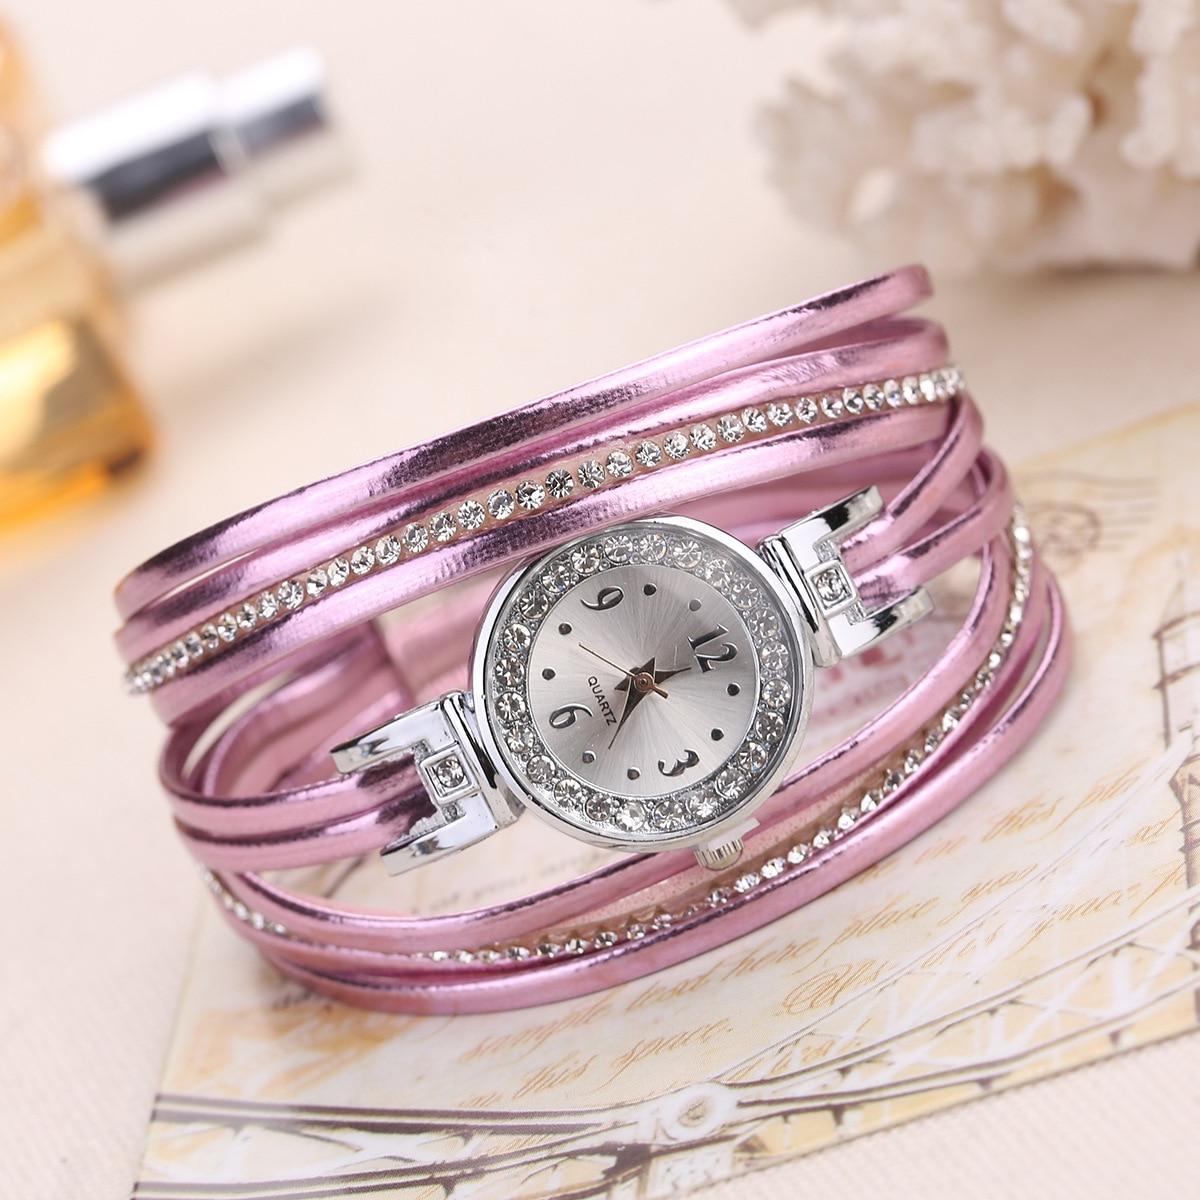 2018 New Arrival Women Luxury Crystal Bracelet Watch Gold Leather Thin Strap Dress Wristwatch Casual Ladies Quartz Clock Ceasuri